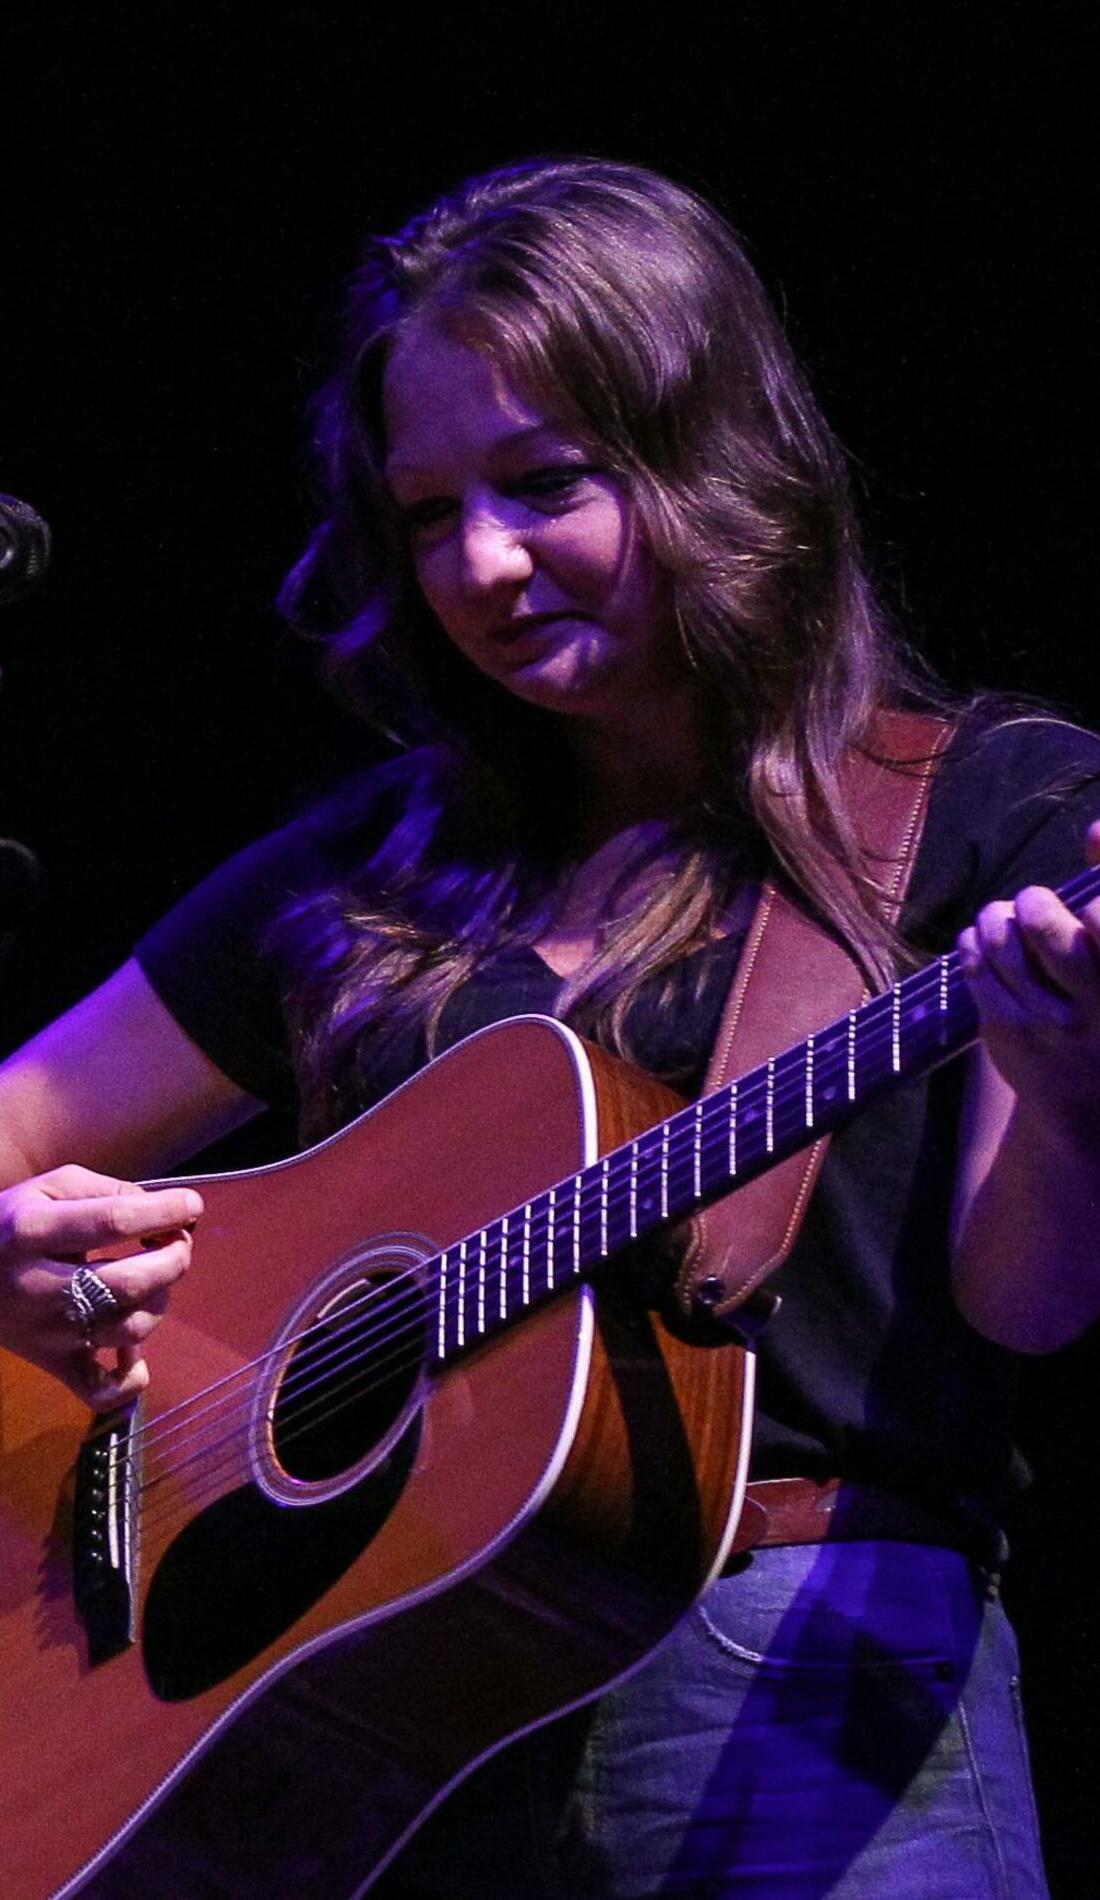 A Kelsey Waldon live event